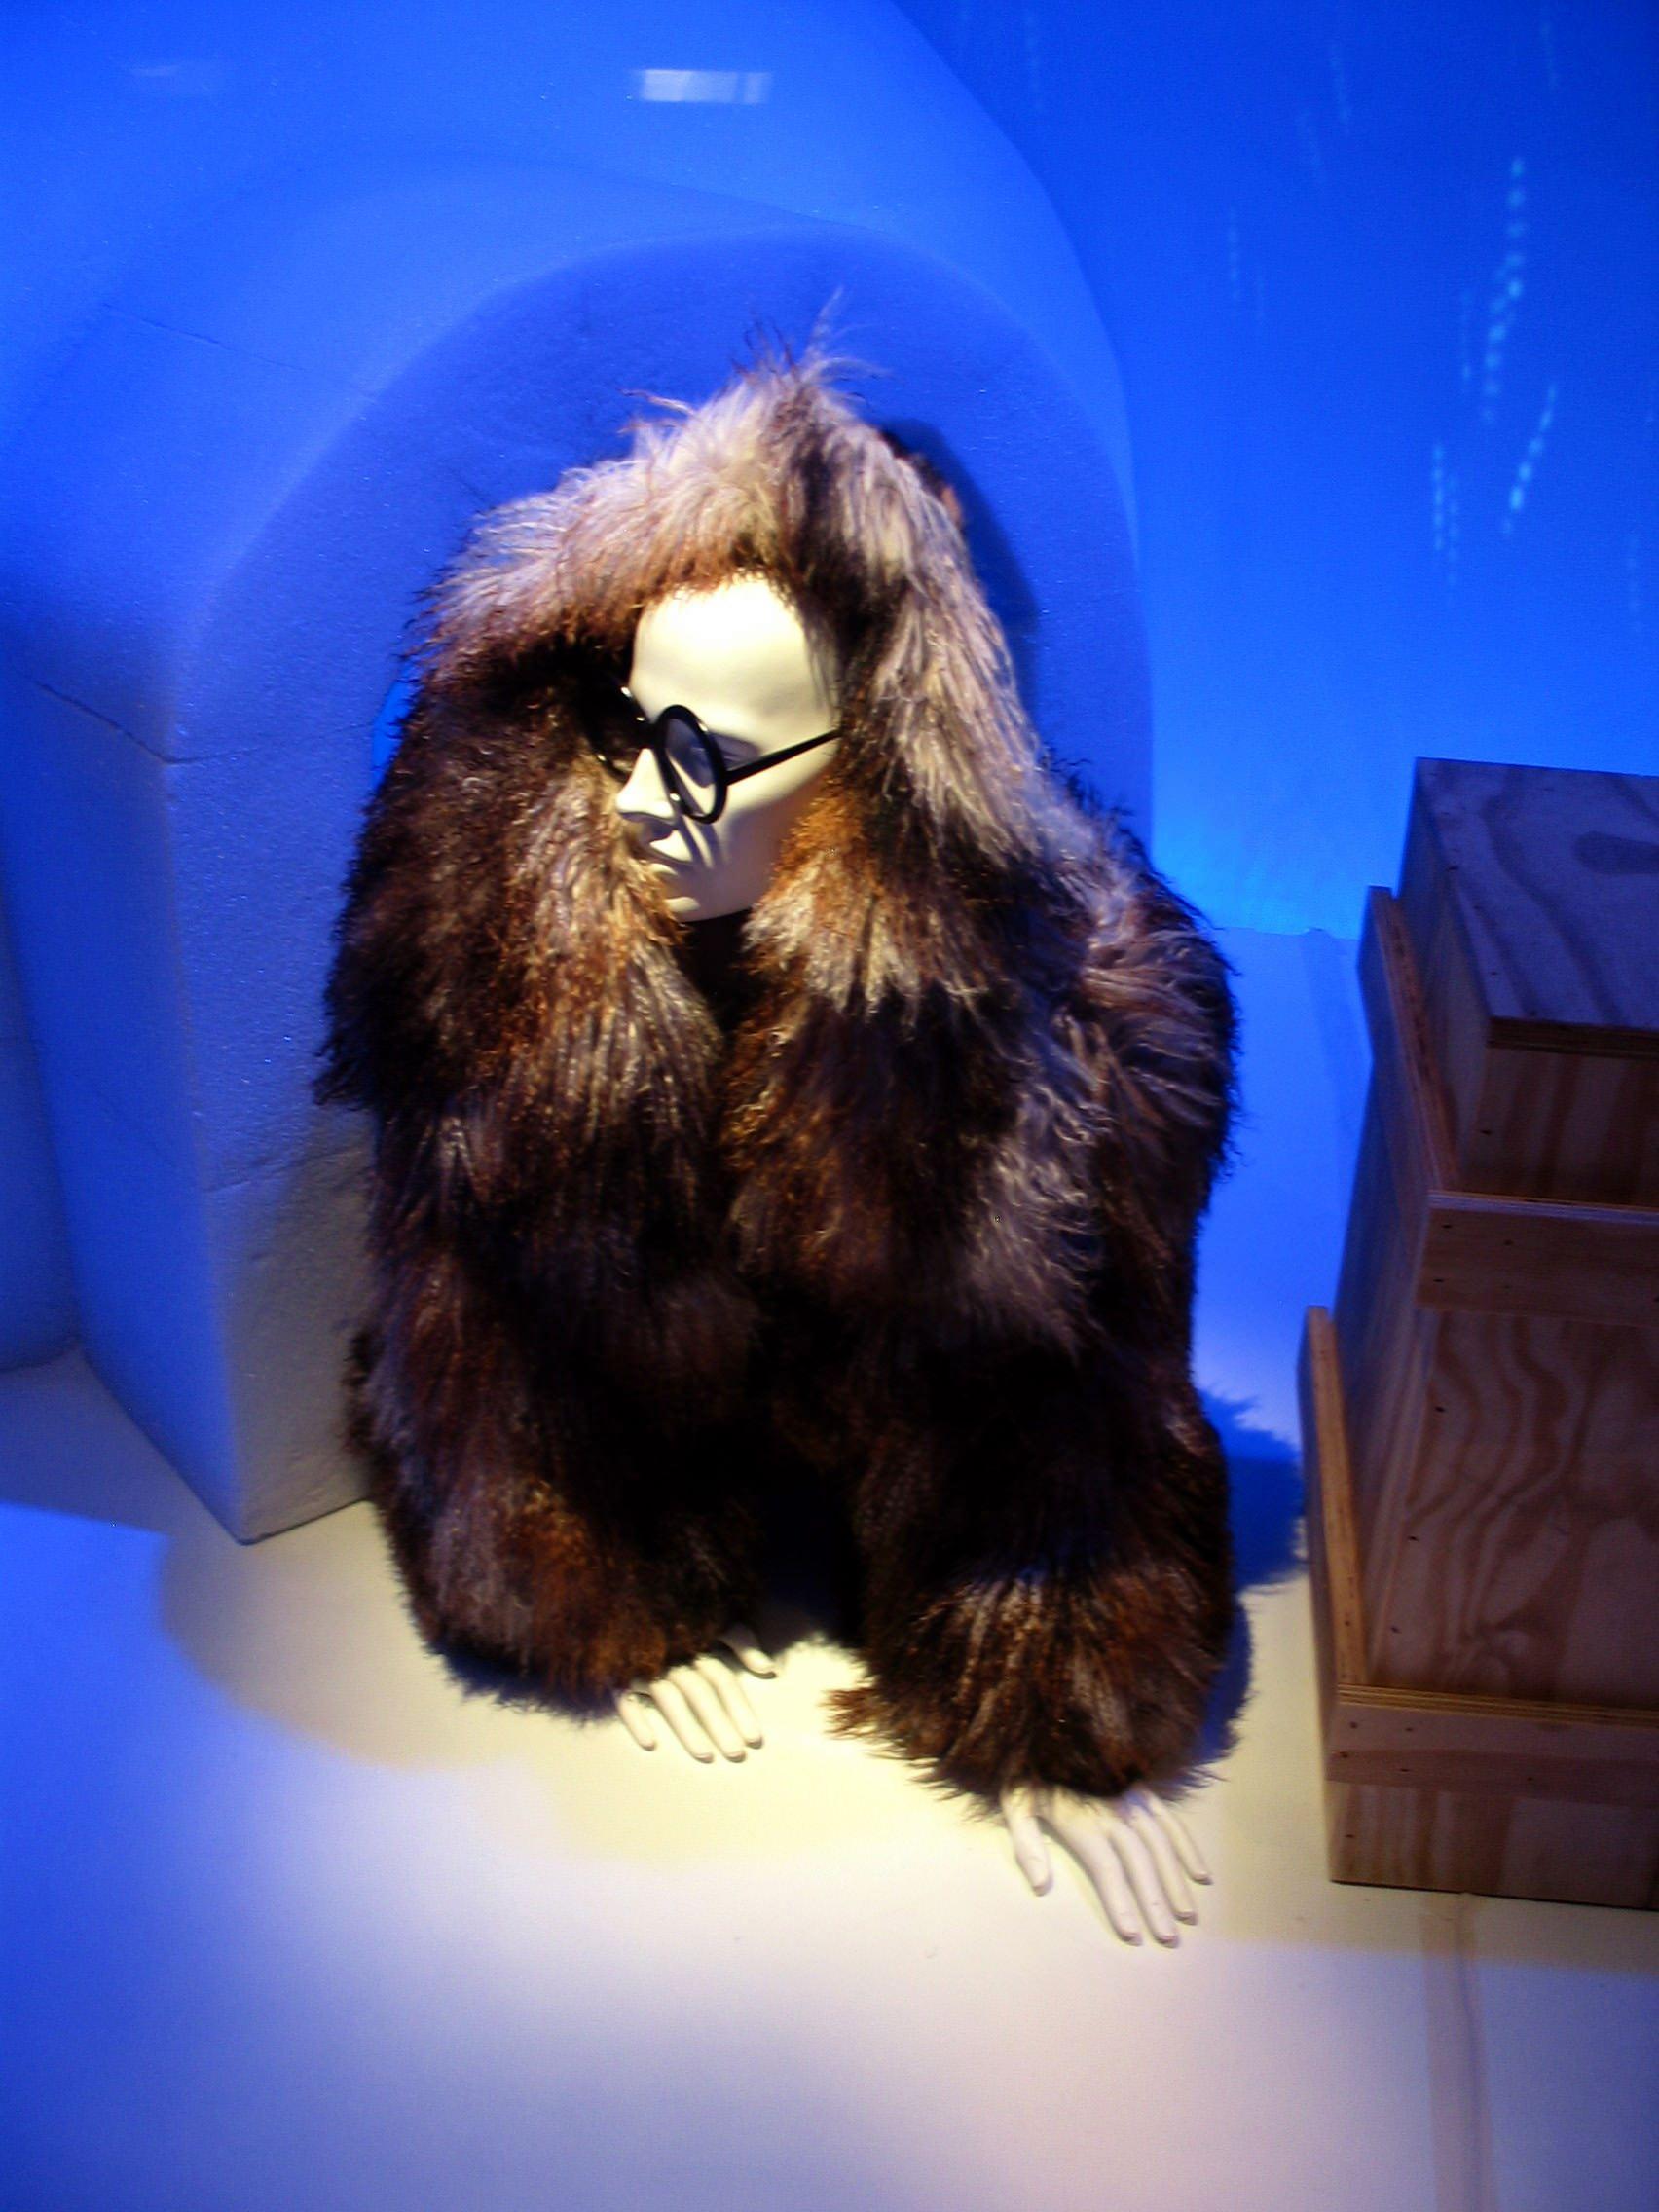 Rara Avis: Selections from the Iris Barrel Apfel Collection - Fendi Mongolian Lamb jacket with petit-gris